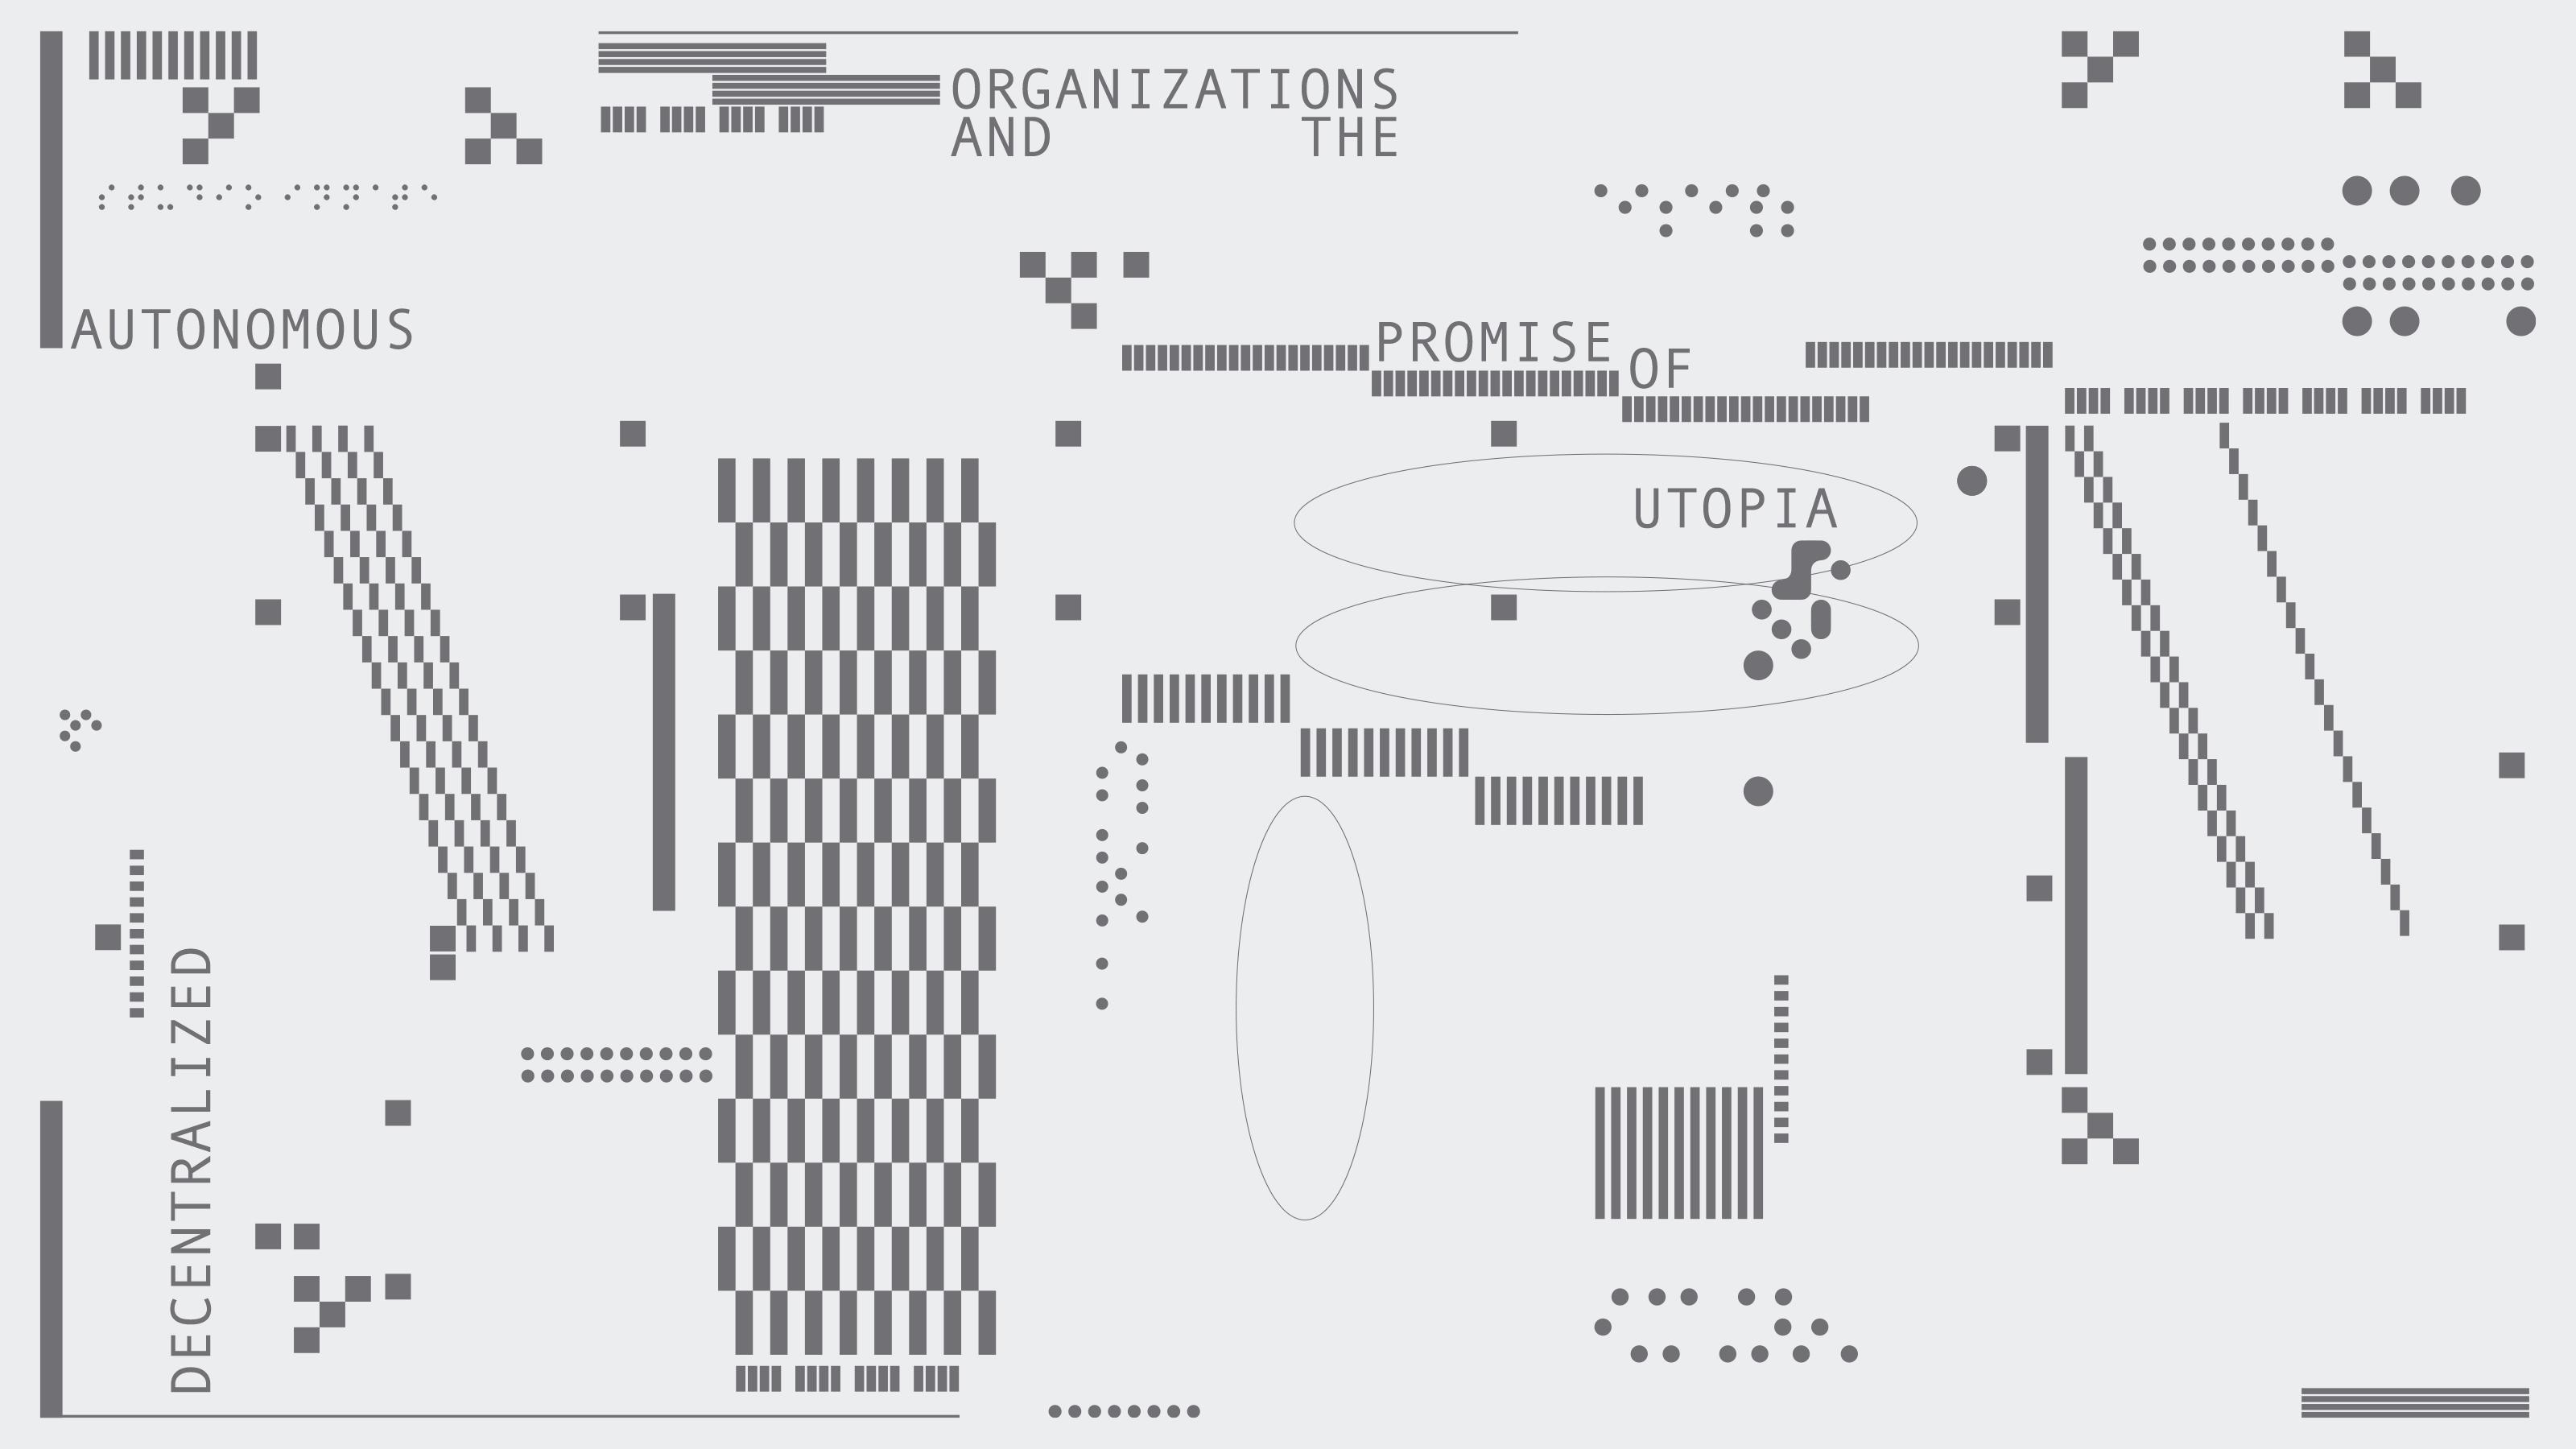 Decentralized Autonomous Organizations and the Promise of Utopia